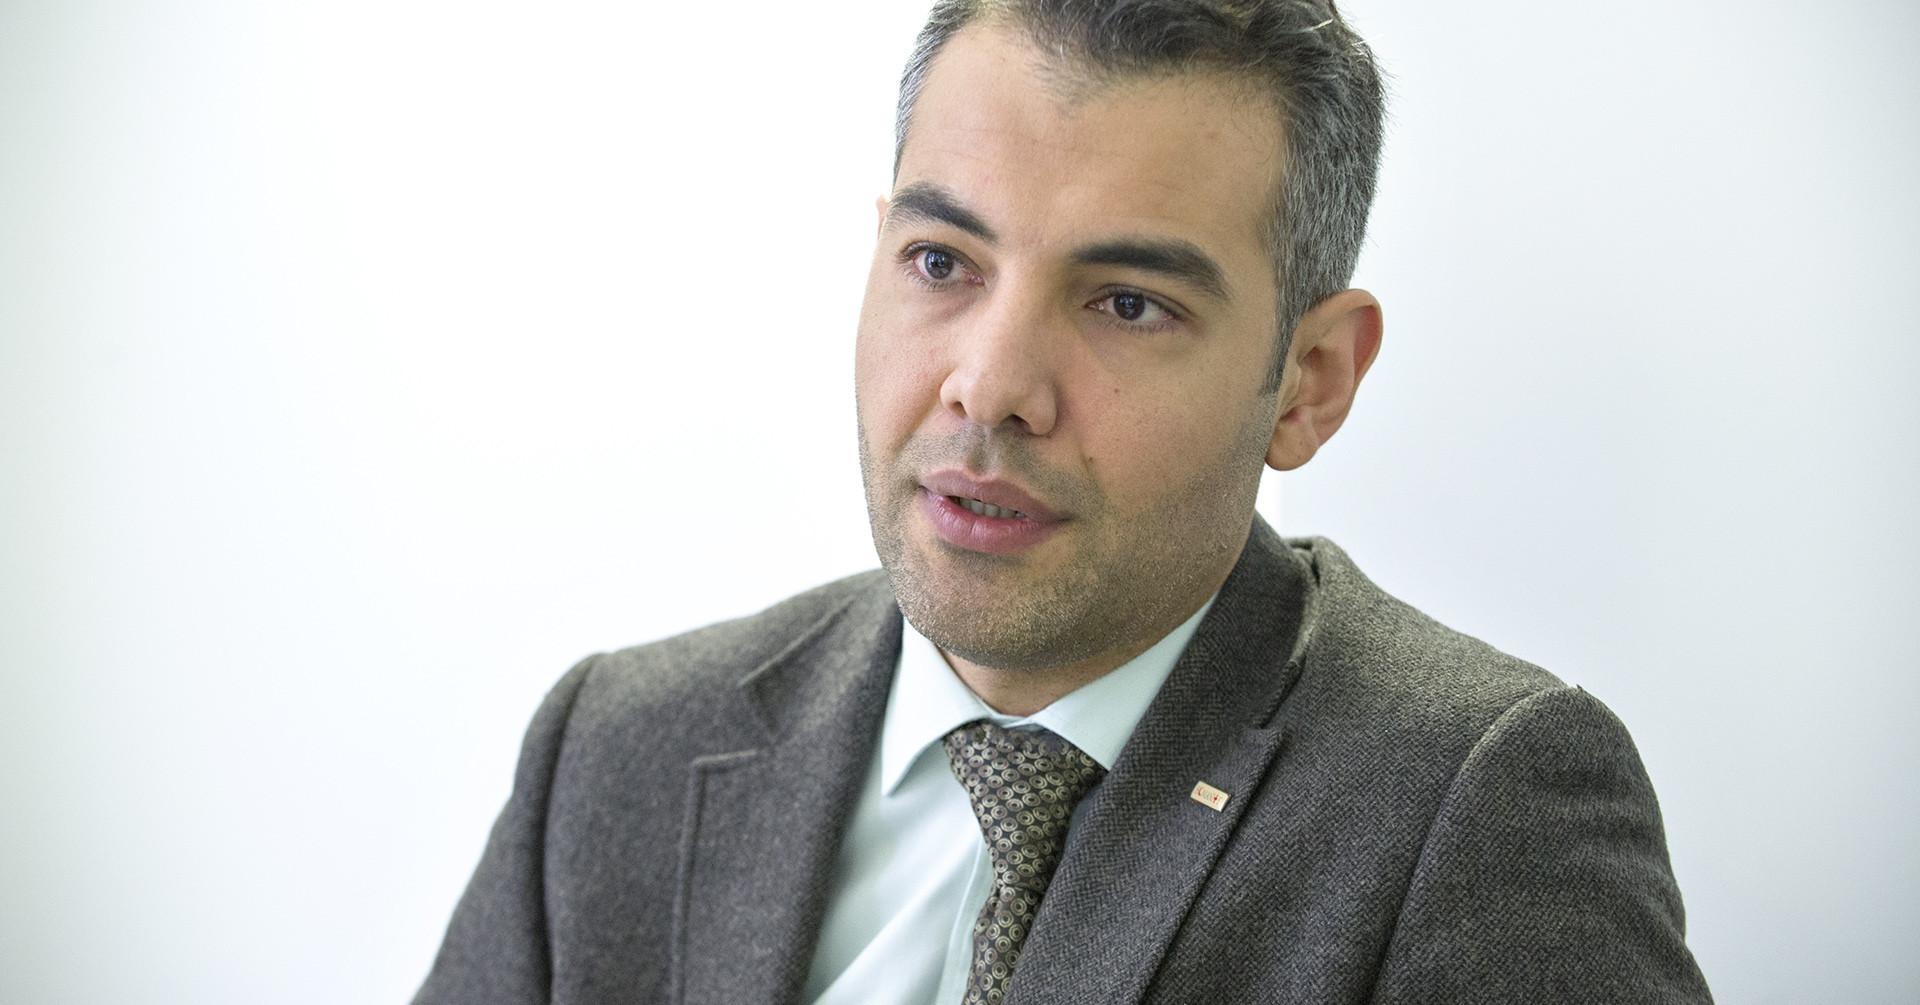 Hussein Al-Taee Lapset